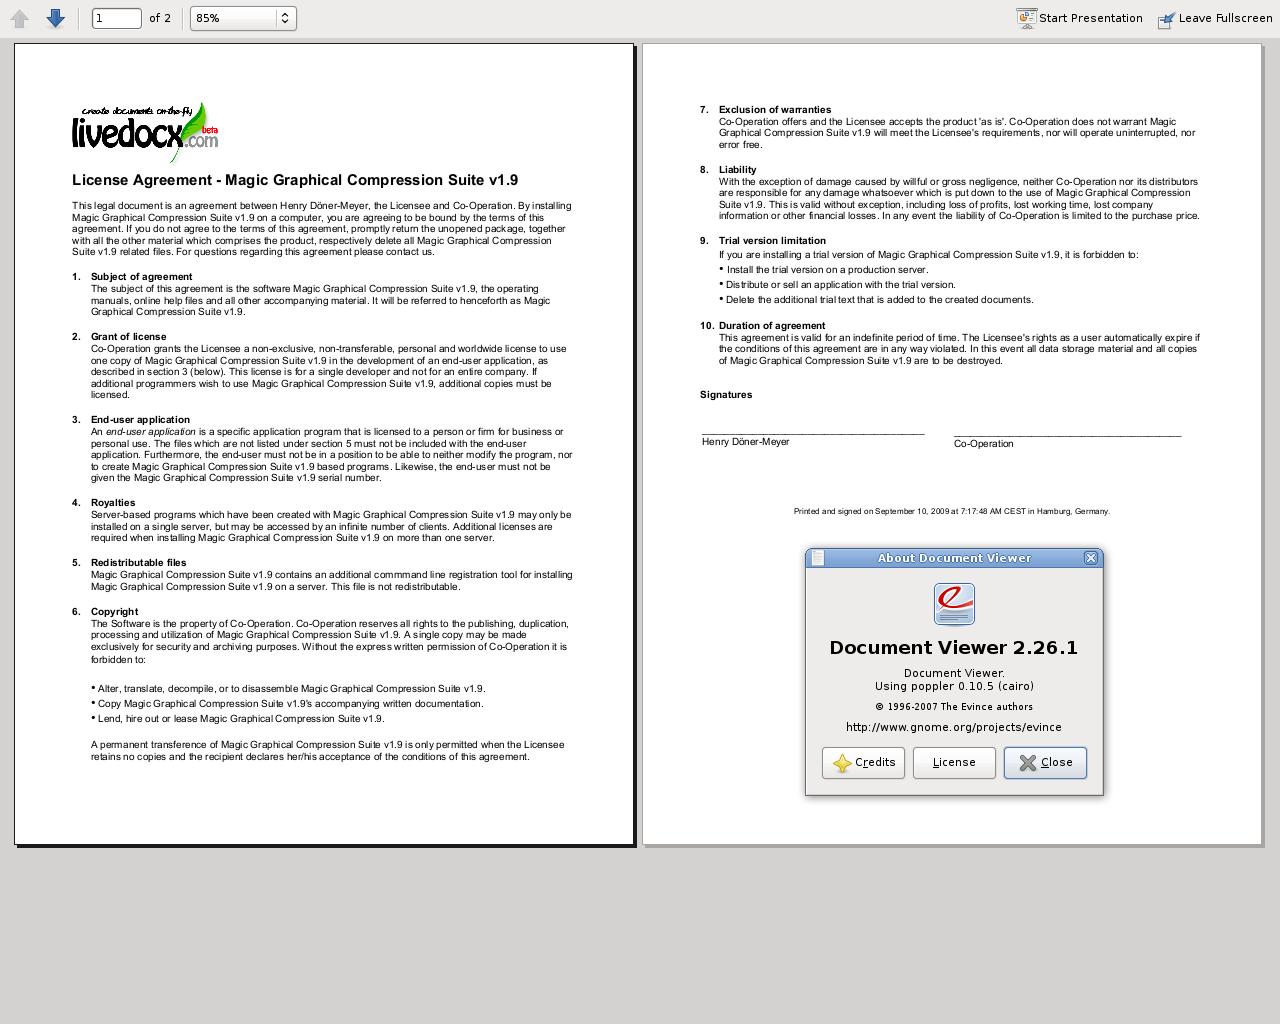 zendservice livedocx zend framework 2 2 1 2 documentation